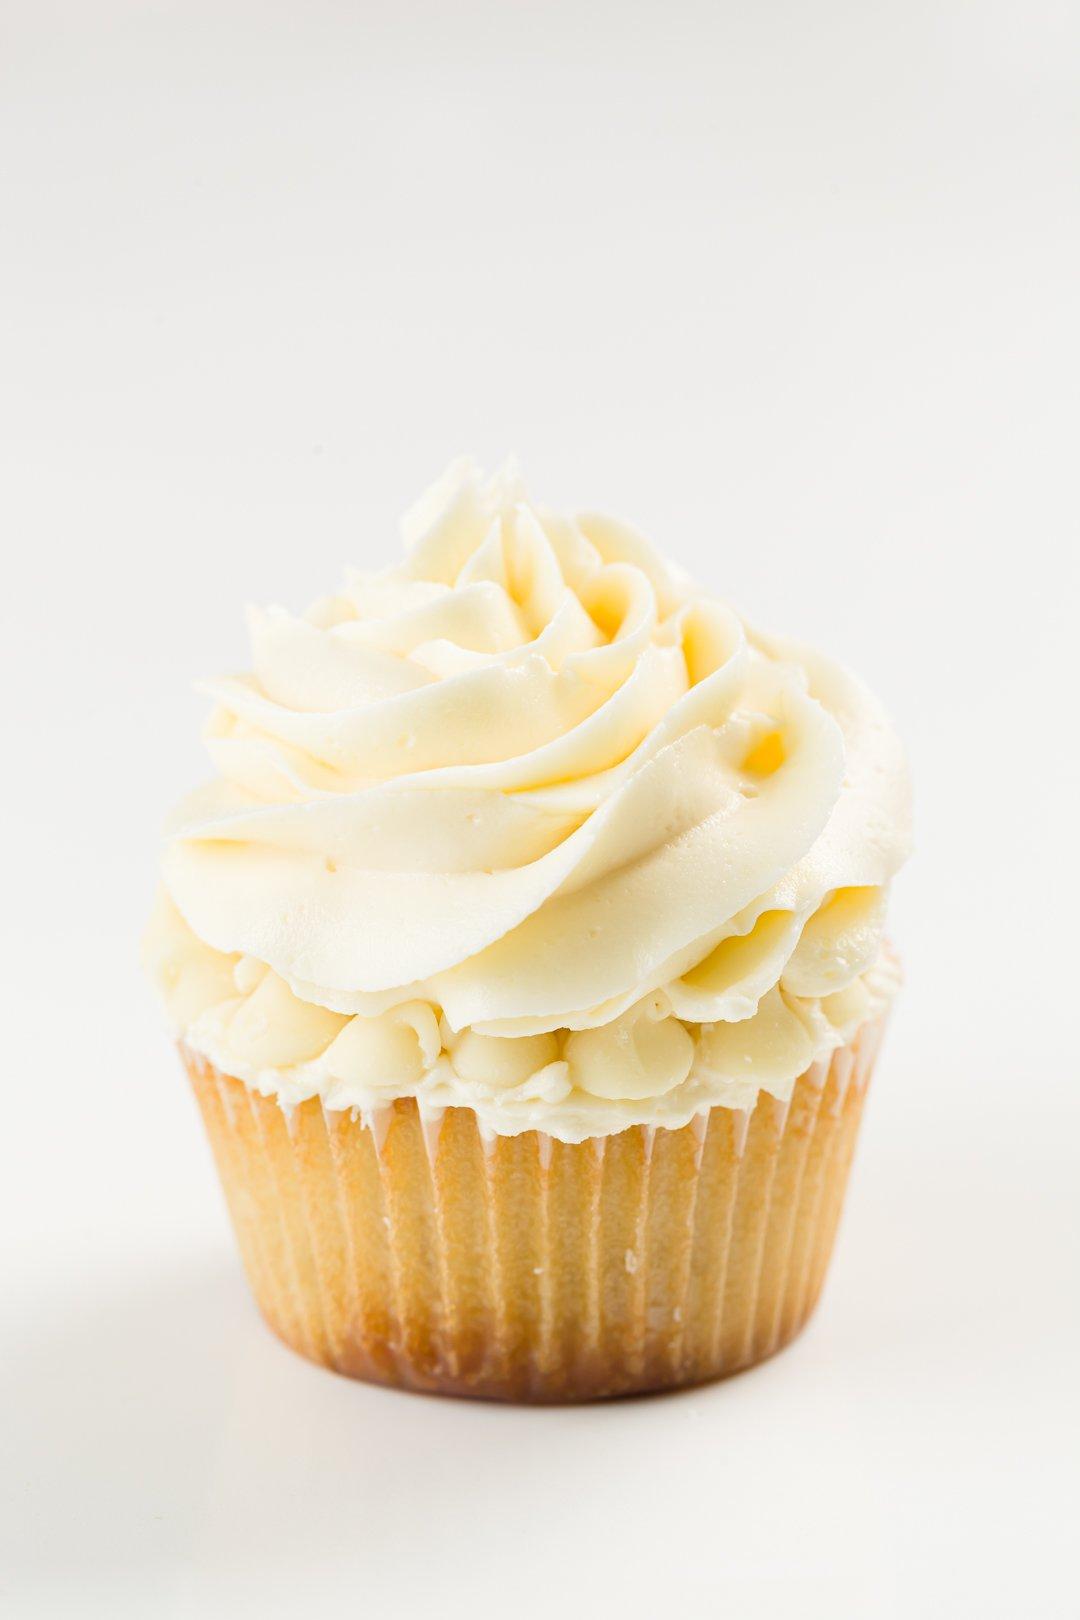 white chocolate buttercream on white chocolate cupcakes